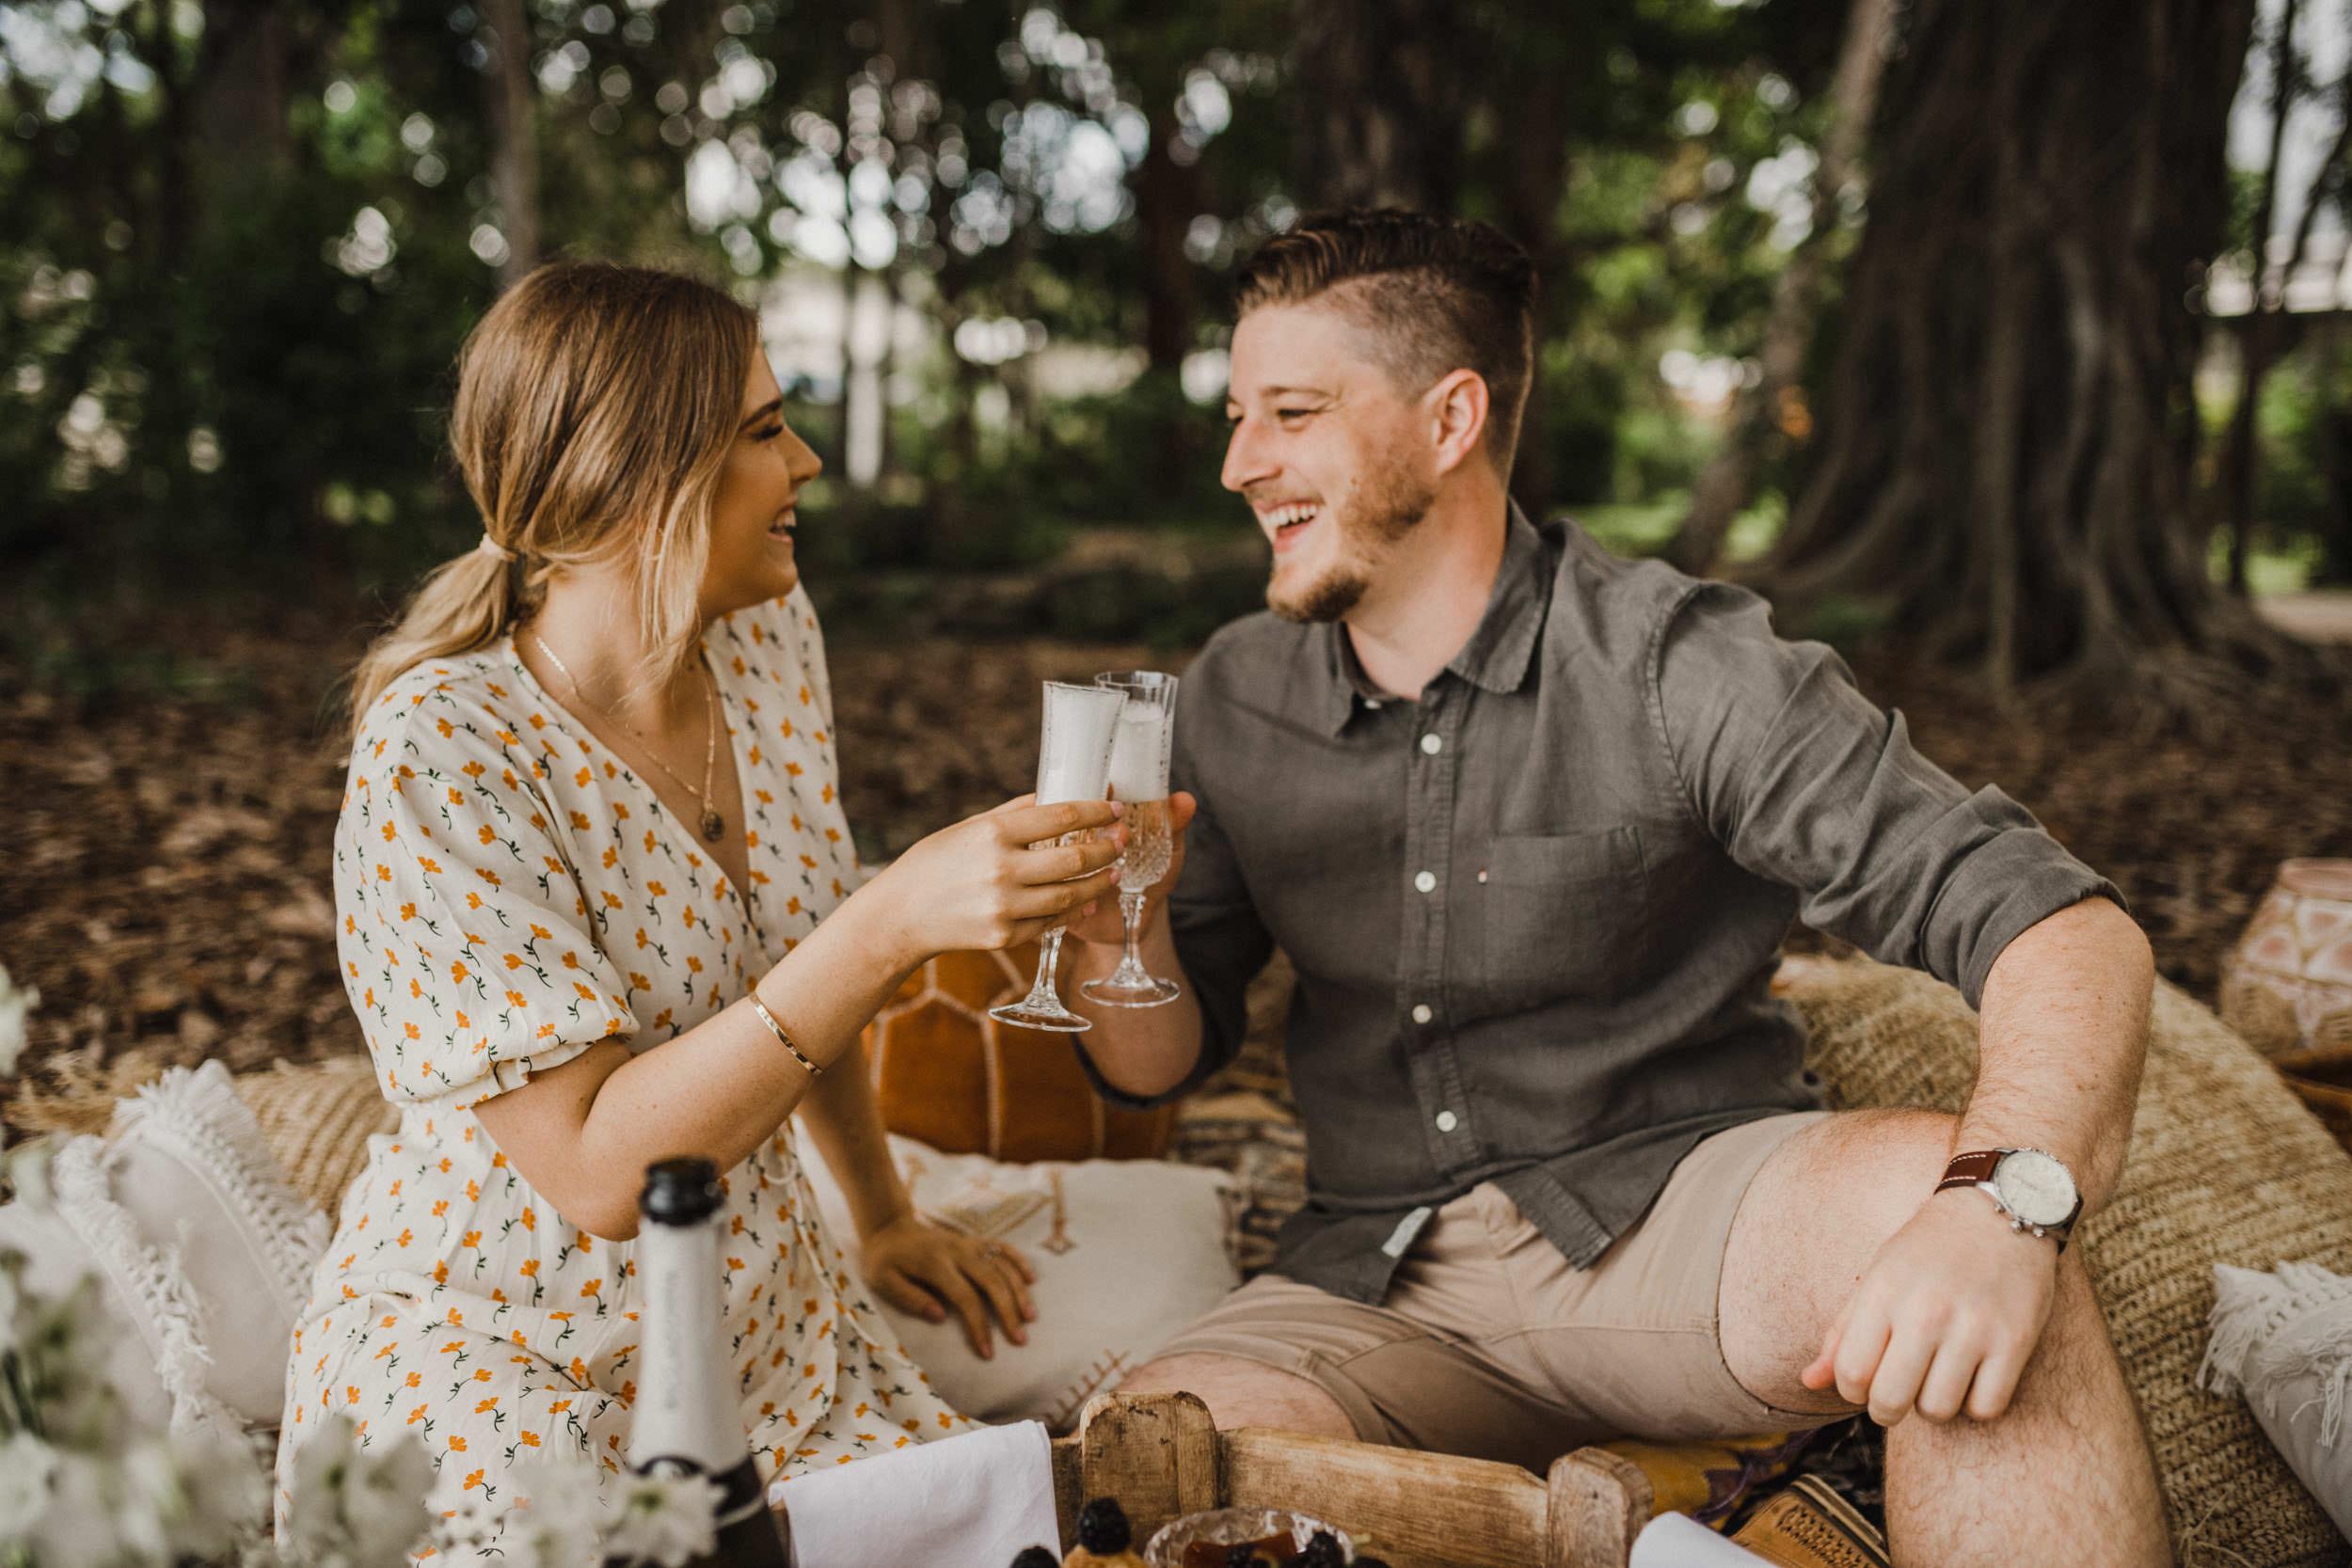 The Raw Photographer - Cairns Wedding Photographer - Beach Engagement Shoot - Candid Picnic-5.jpg